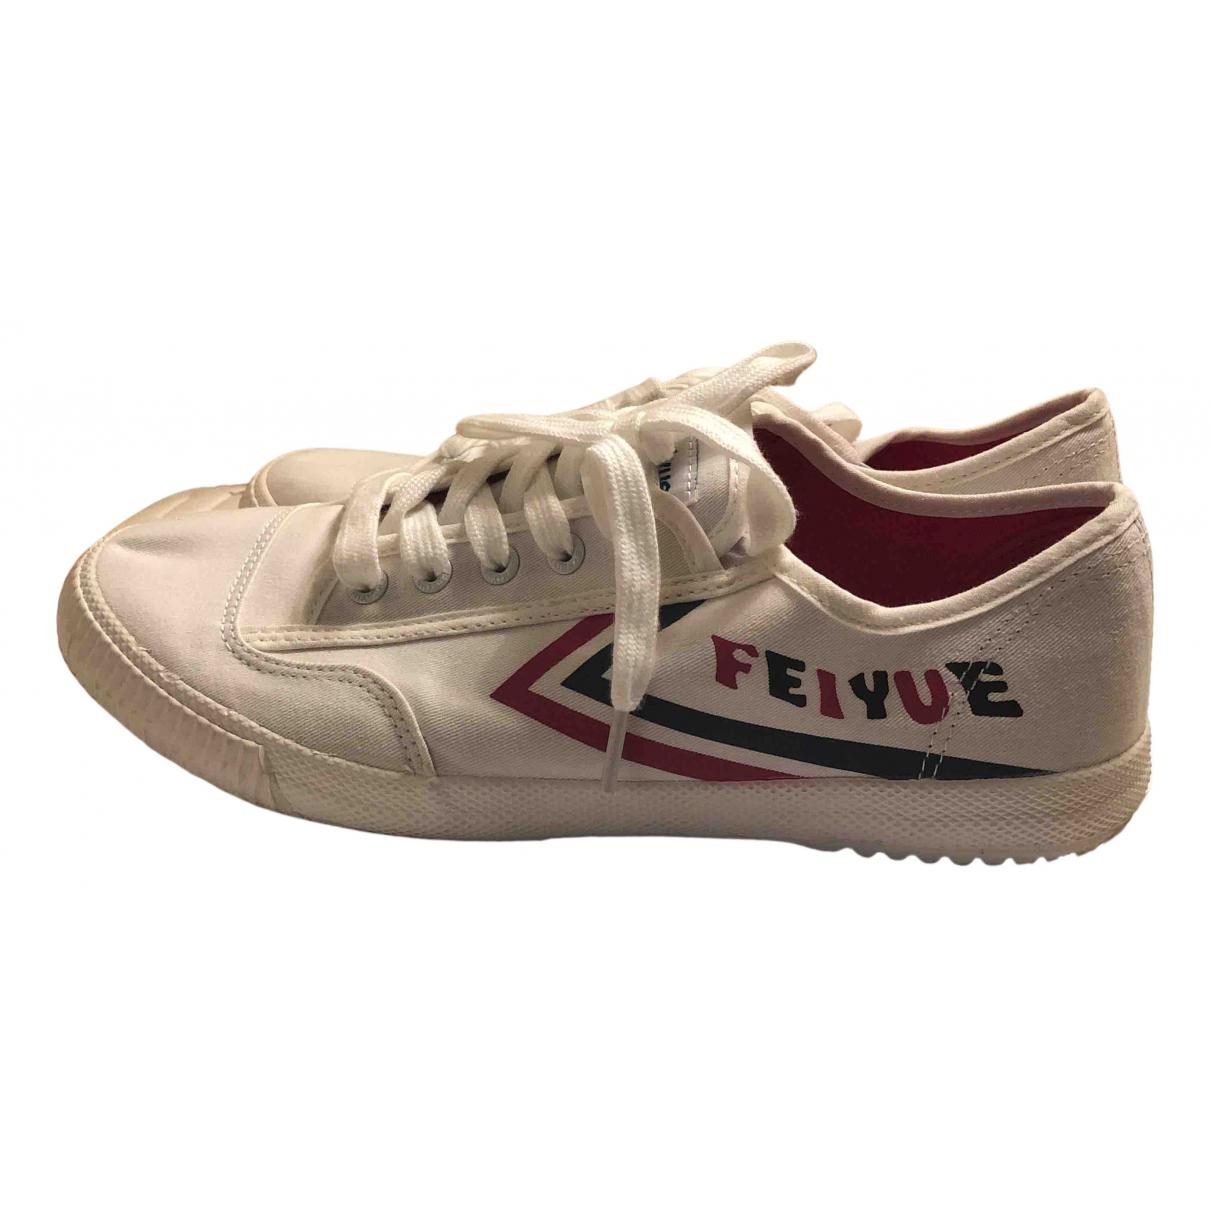 Feiyue \N Sneakers in  Weiss Kautschuk